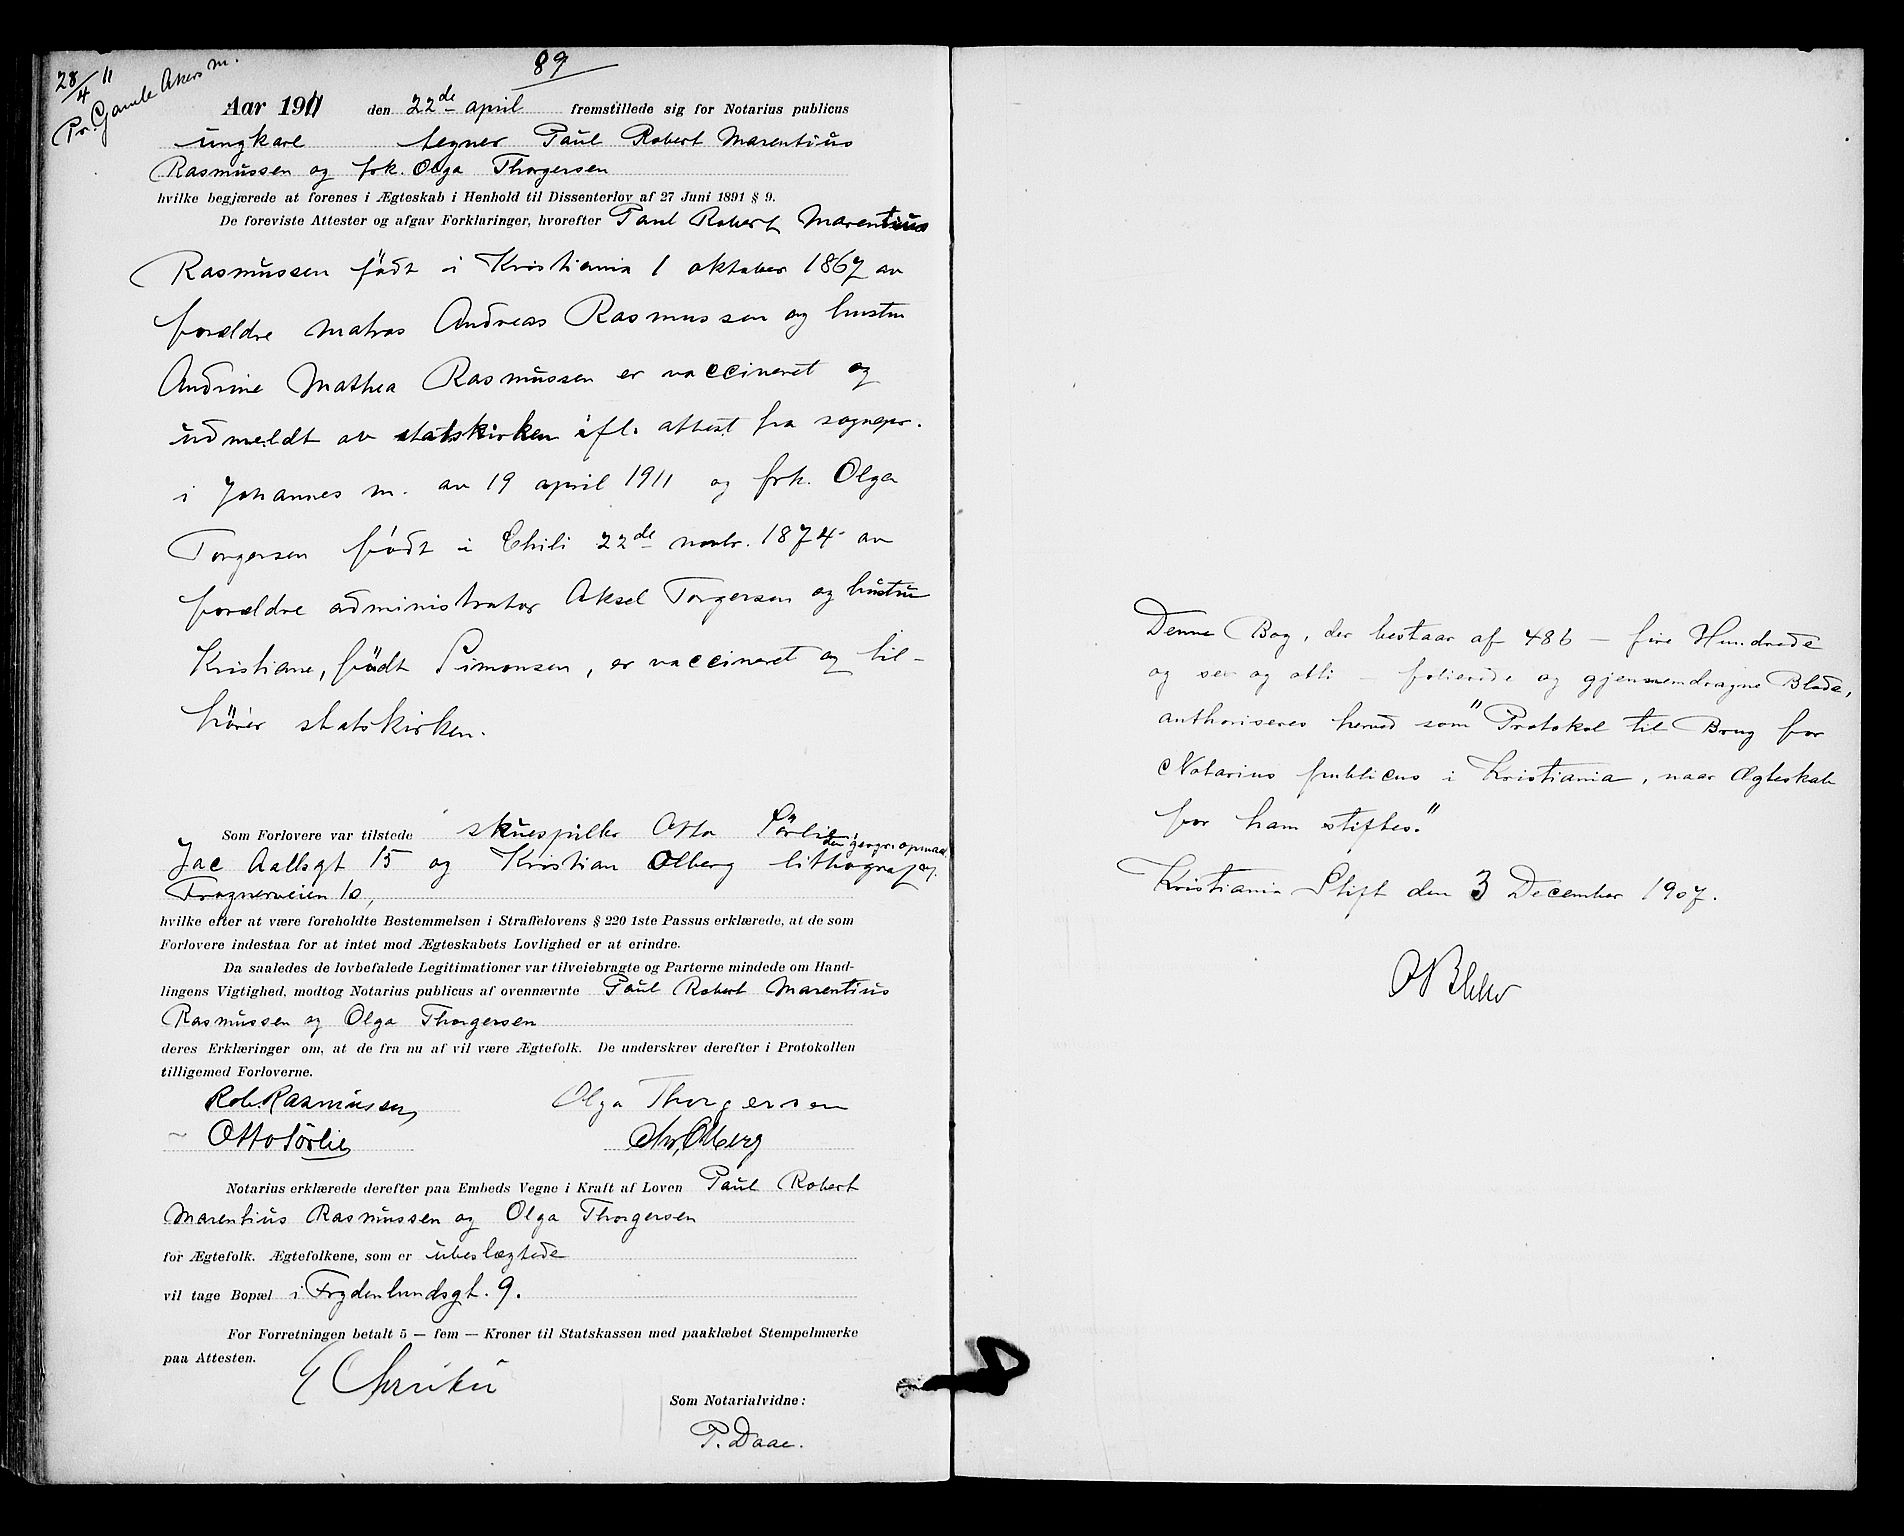 SAO, Oslo byfogd avd. I, L/Lb/Lbb/L0007: Notarialprotokoll, rekke II: Vigsler, 1907-1911, s. 486b-487a